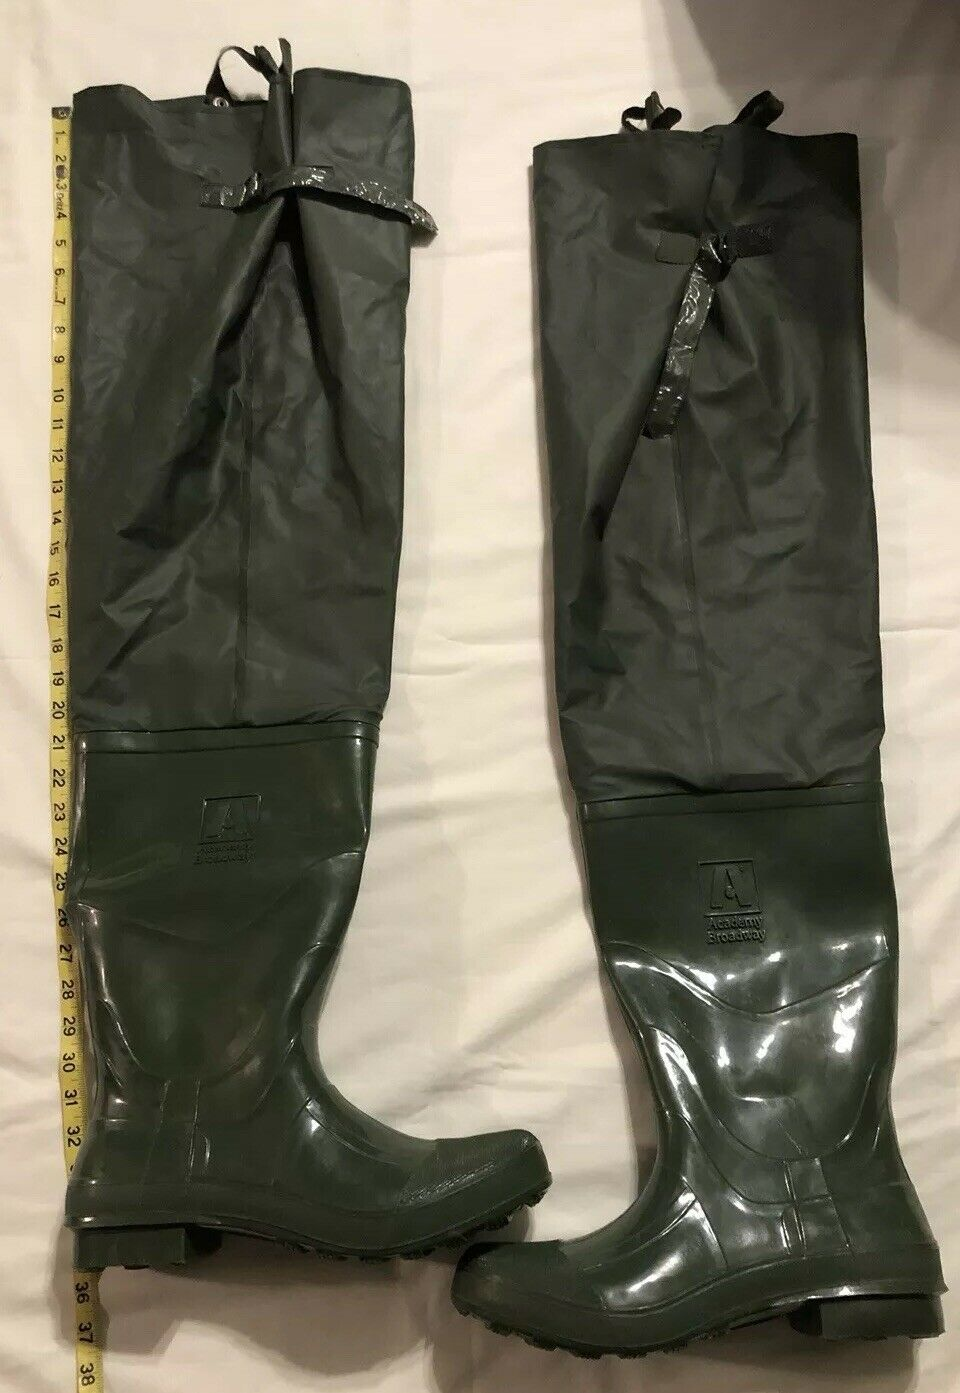 Academy Broadway O.D. Green  Waders Fishing Boots Sz 10  Wetha Guard Rainwear EUC  ultra-low prices